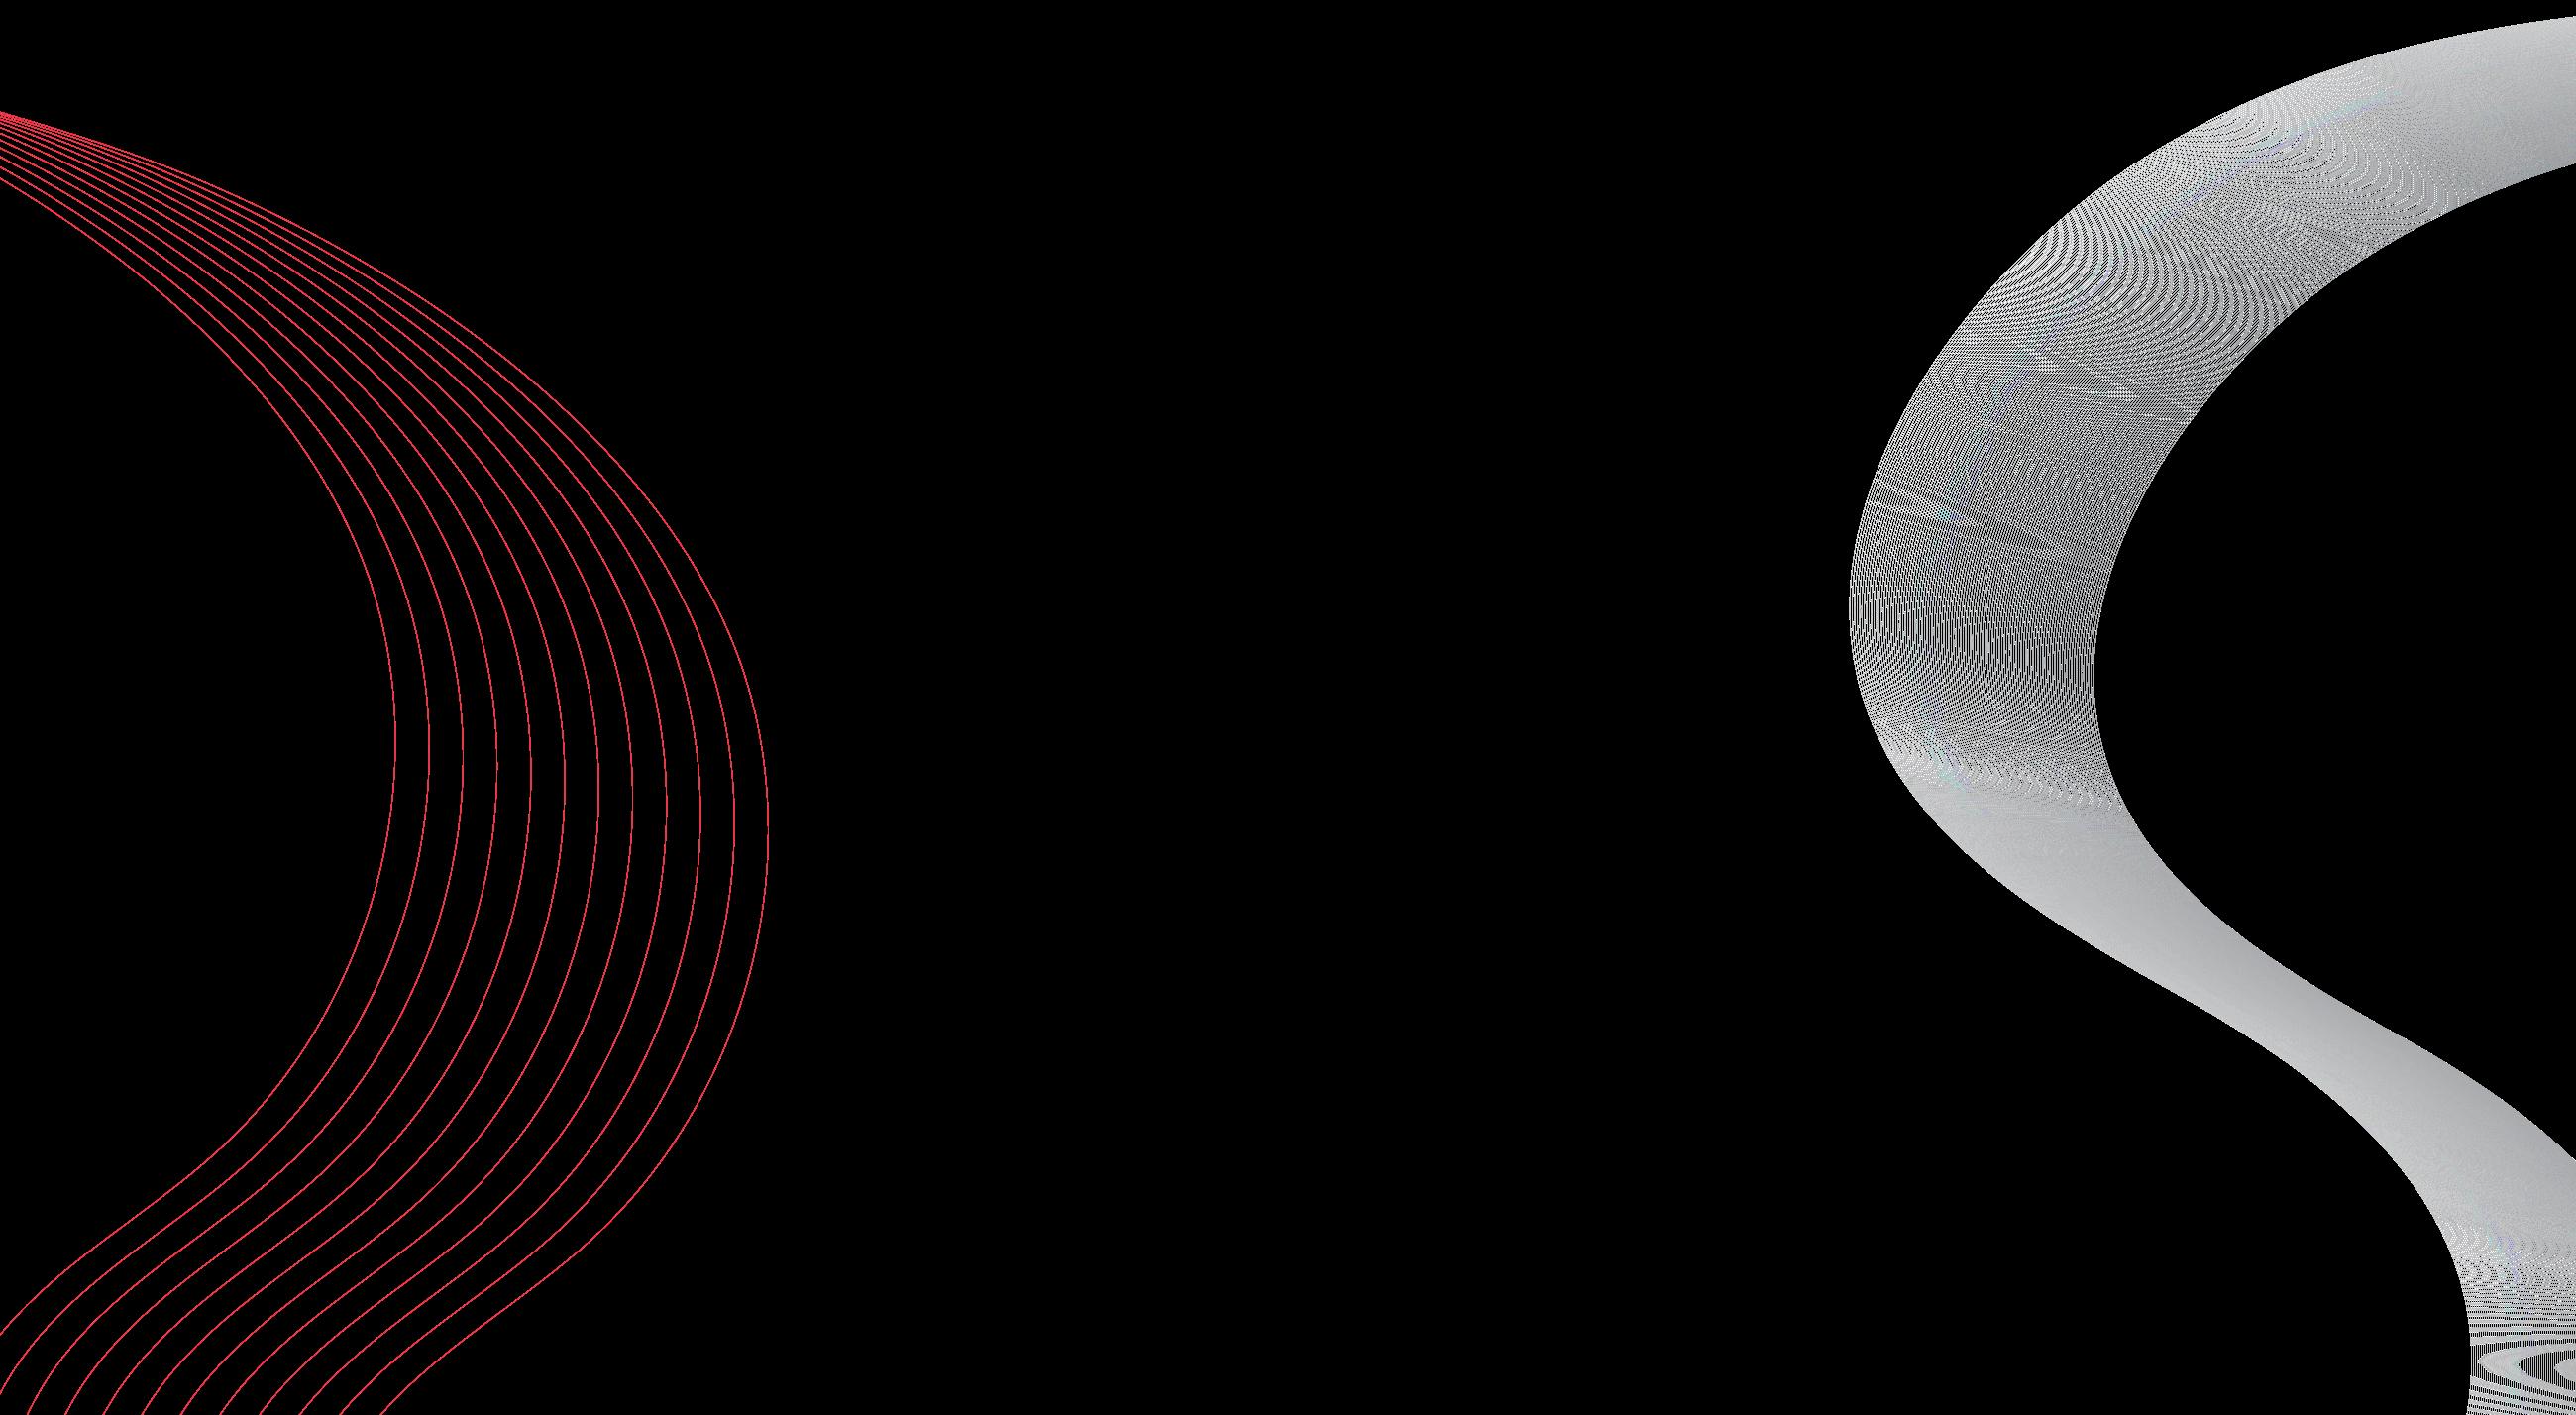 lines-bg-2 3